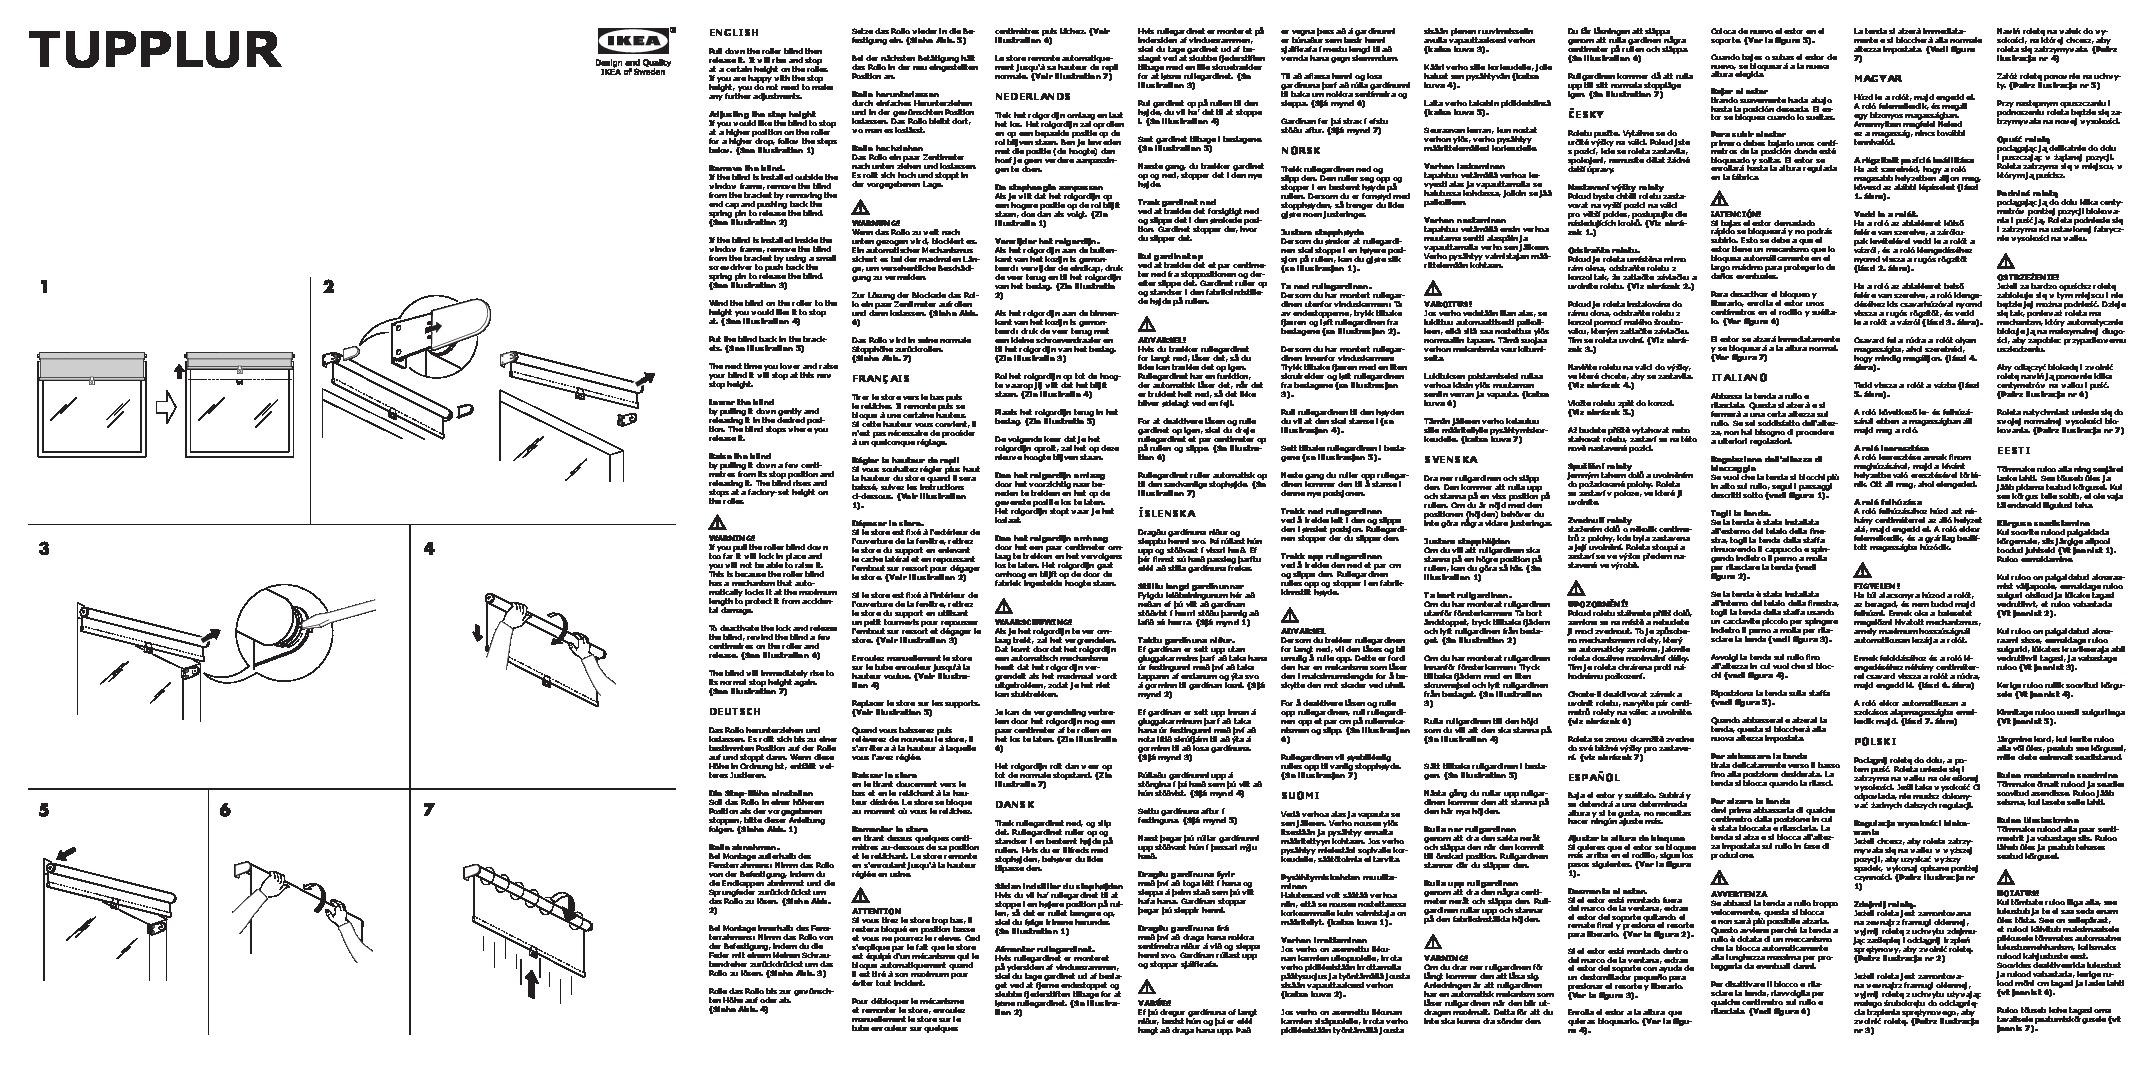 ikea blinds tupplur instructions